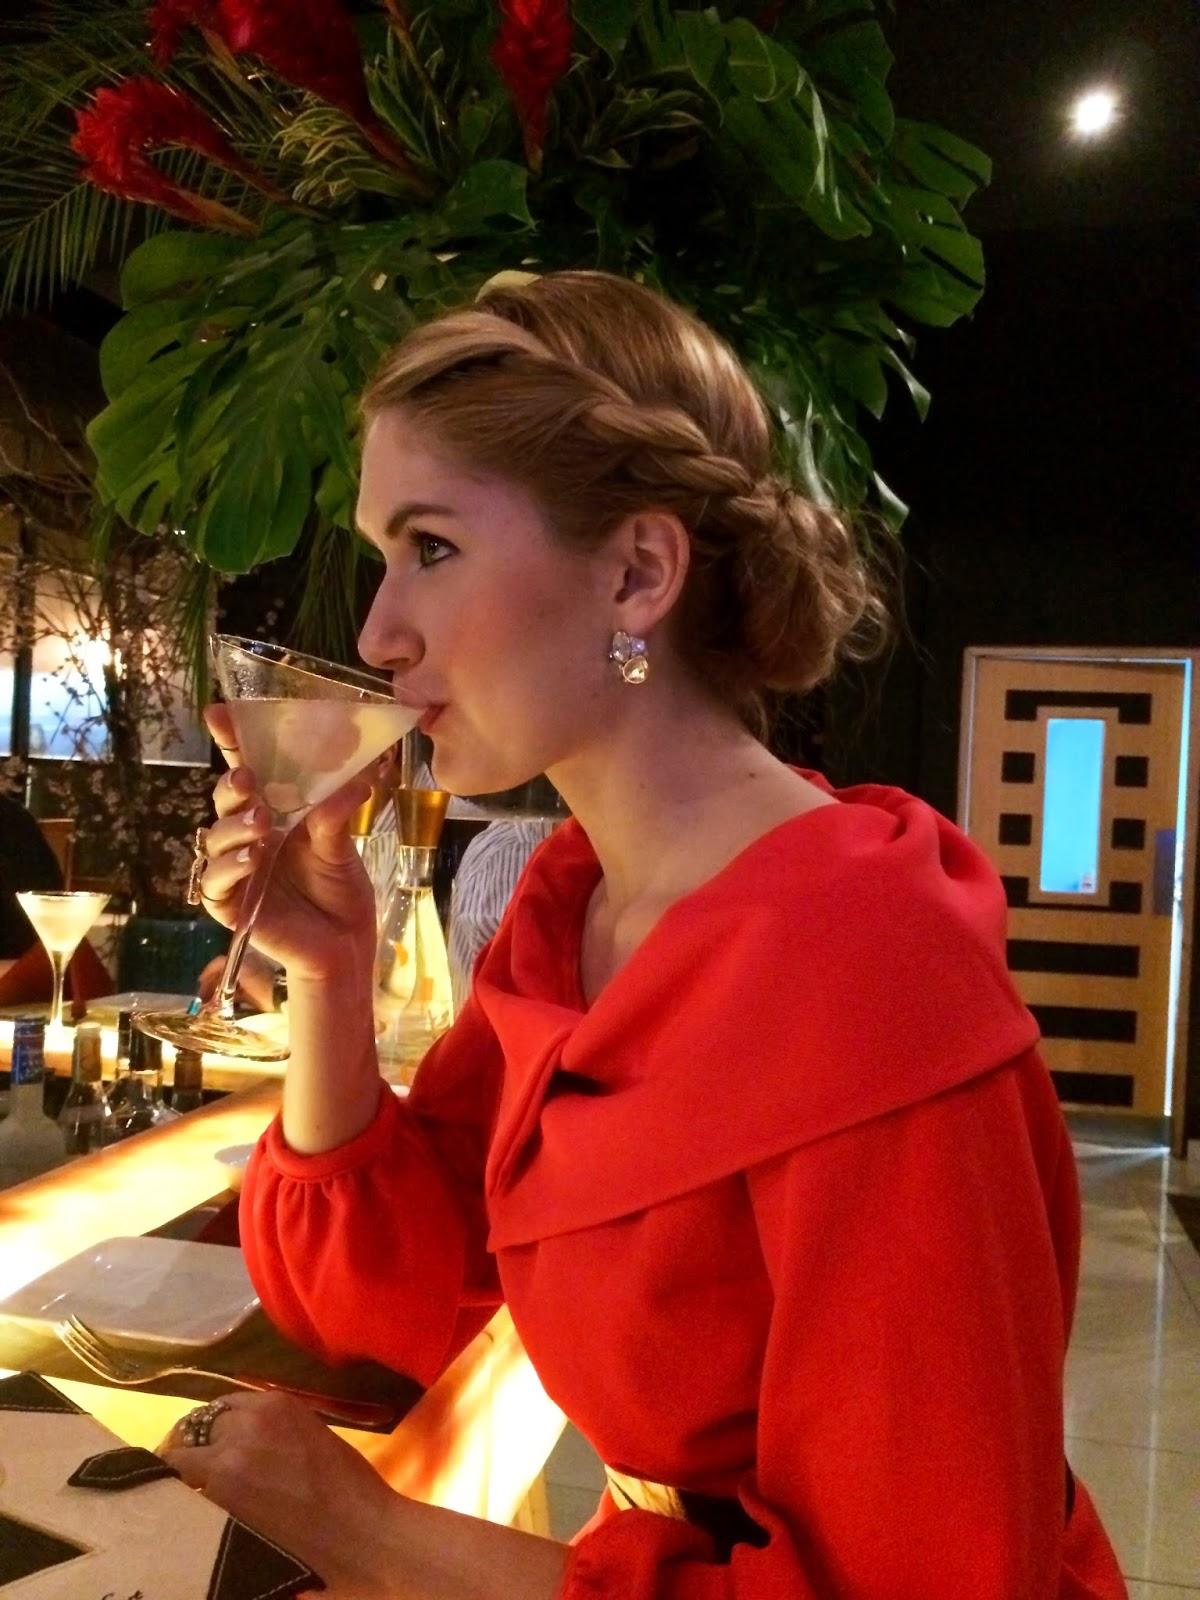 panama restaurantes, panama sake, sake restaurante, panama bar, panama tourism, panama restaurant, lychee martini, martini